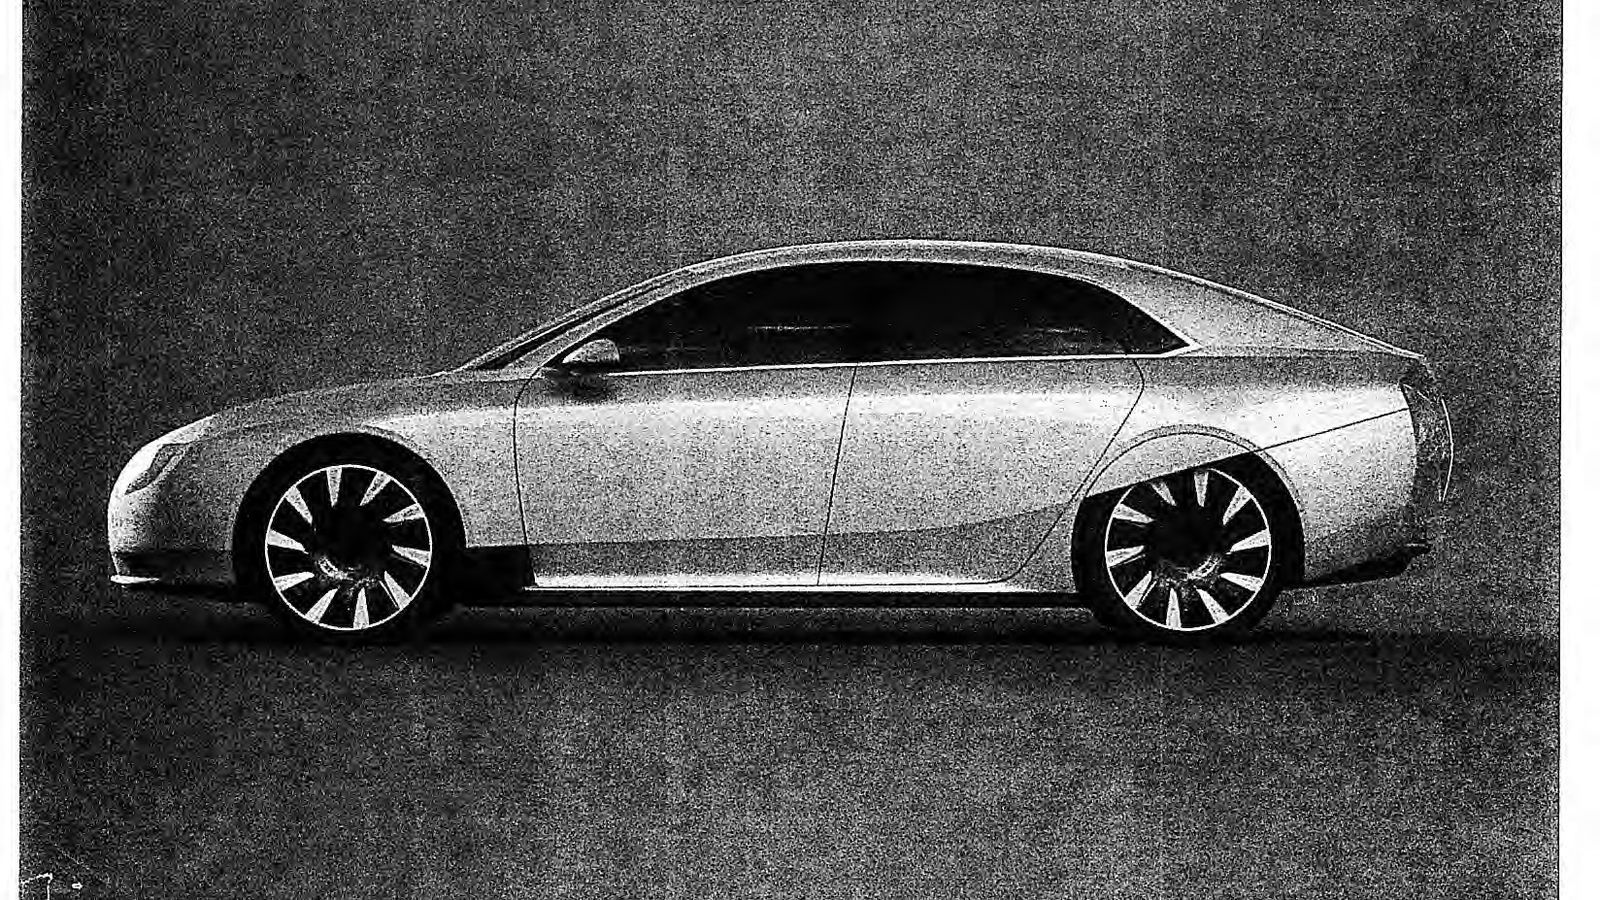 tesla rival atieva s first electric car looks a lot like a model s rh pinterest com